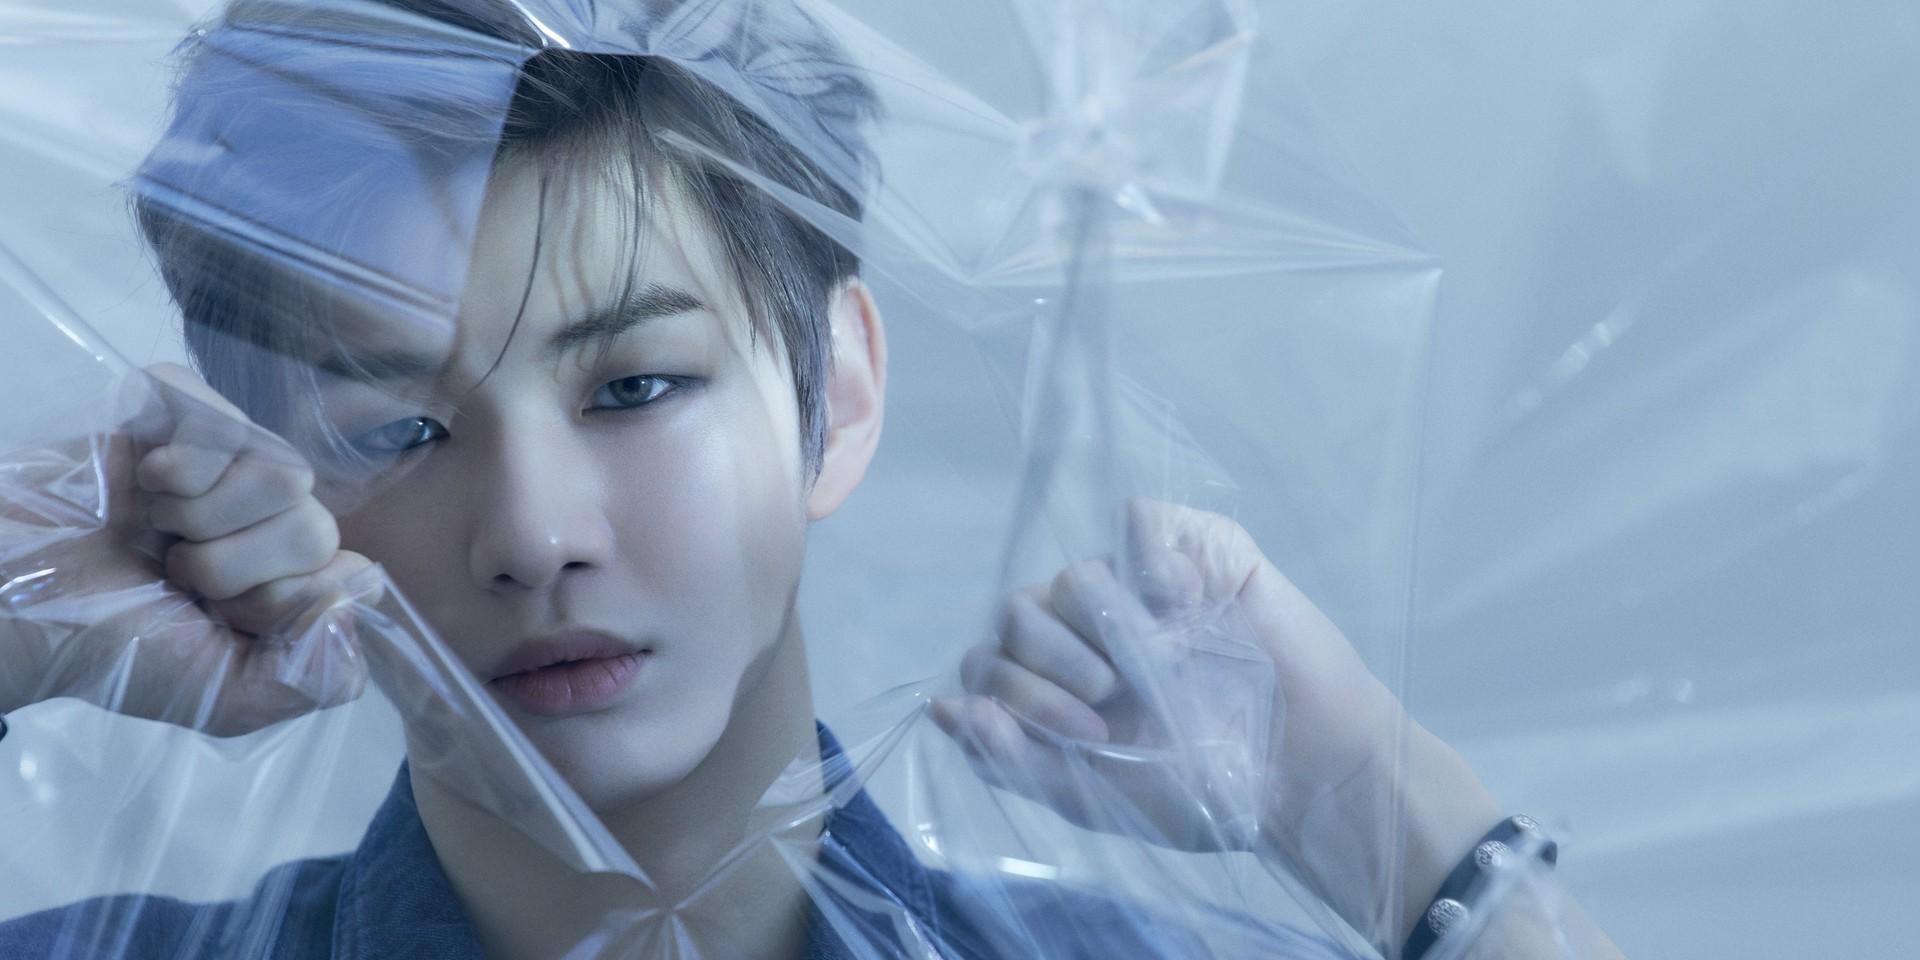 Kang Daniel to drop new mini-album 'YELLOW' this April